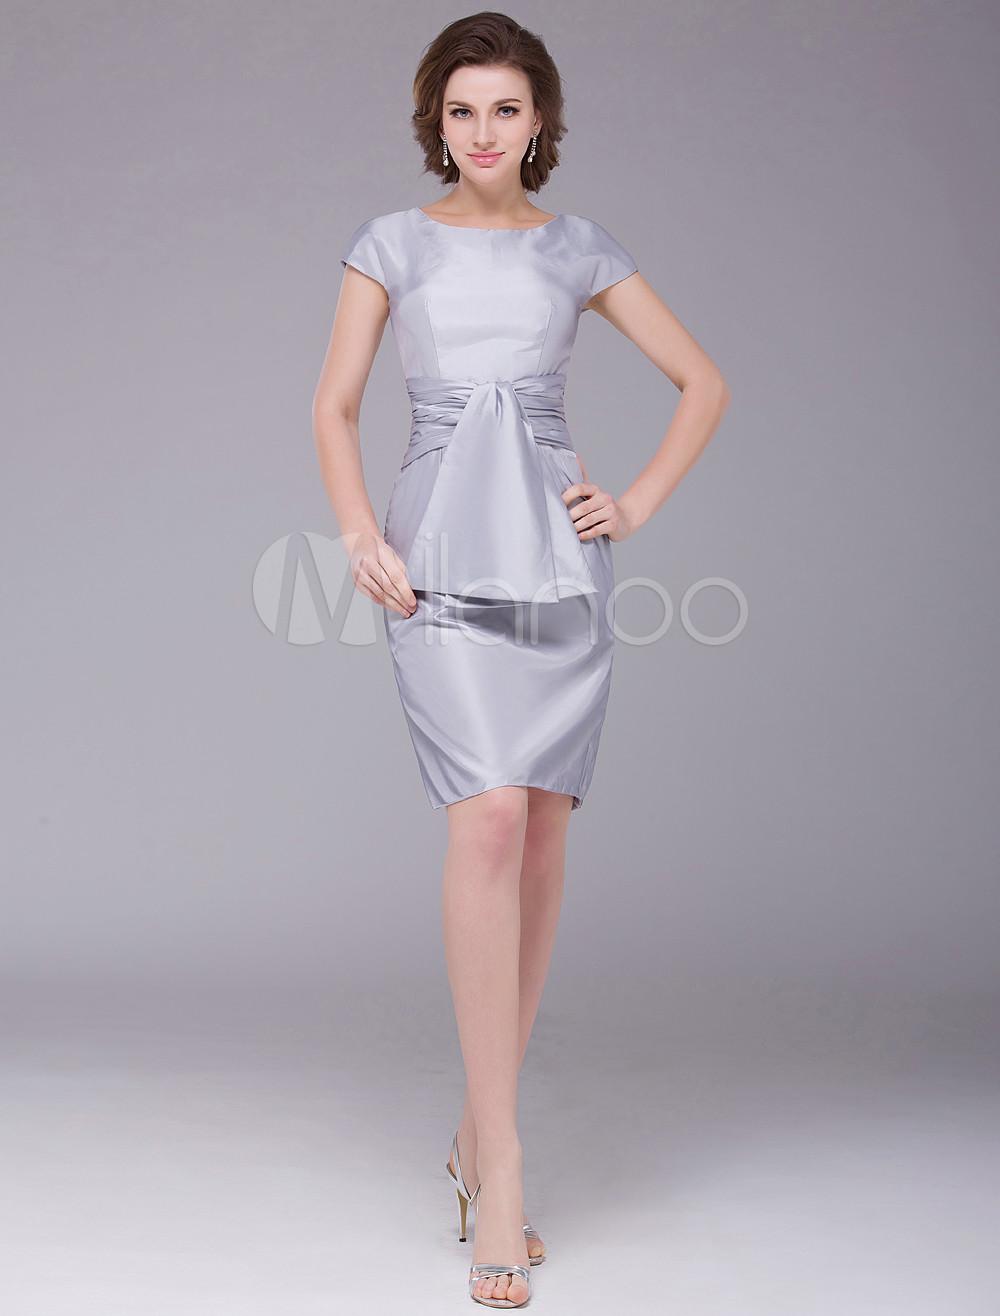 Beautiful Silver Sheath Pleated Zipper Taffeta Bridal Mother Dress Wedding Guest Dress photo